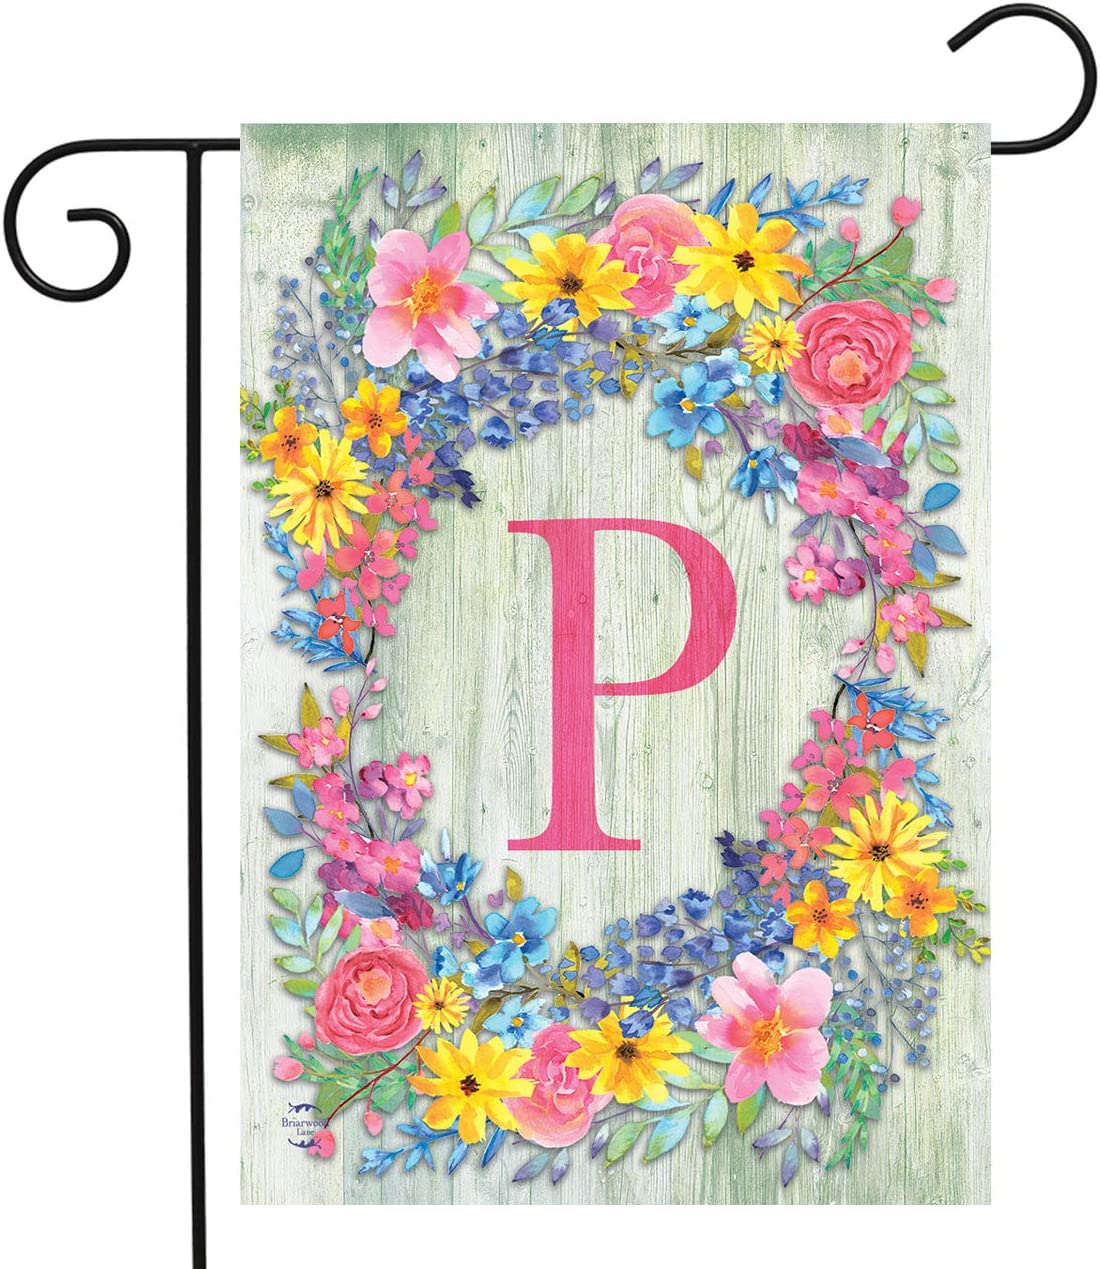 "Briarwood Lane Spring Monogram Letter P Garden Flag Floral Wreath 12.5"" x 18"""